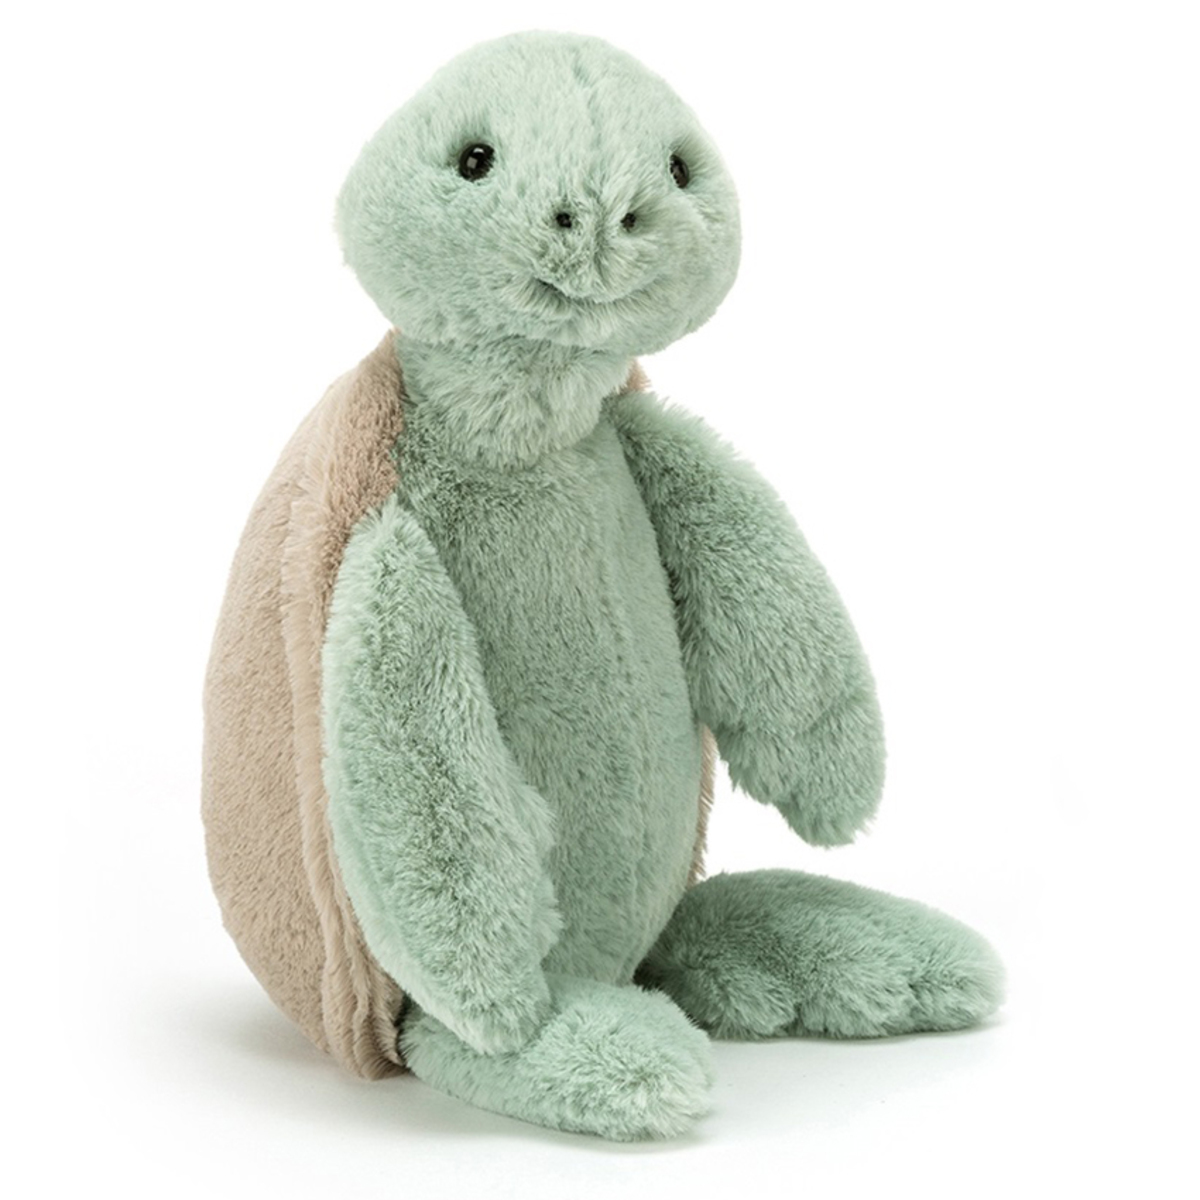 Peluche Bashful Turtle - Medium